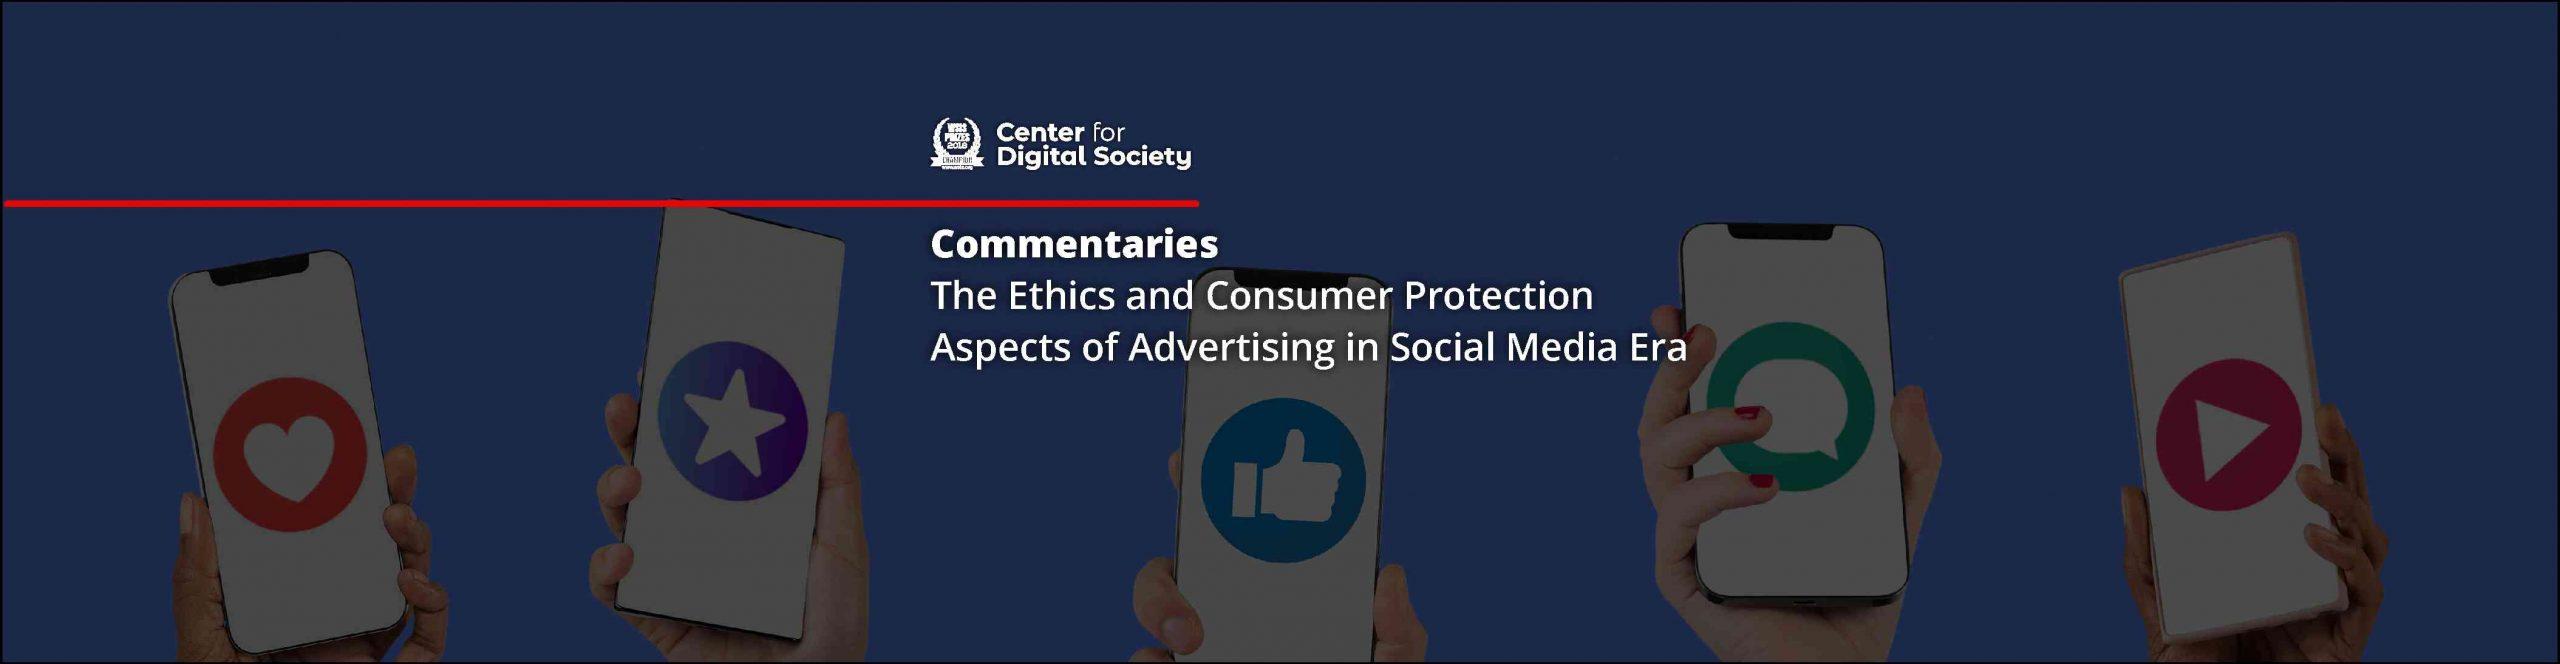 Aspek Etika dan Perlindungan Konsumen Periklanan di Era Media Sosial